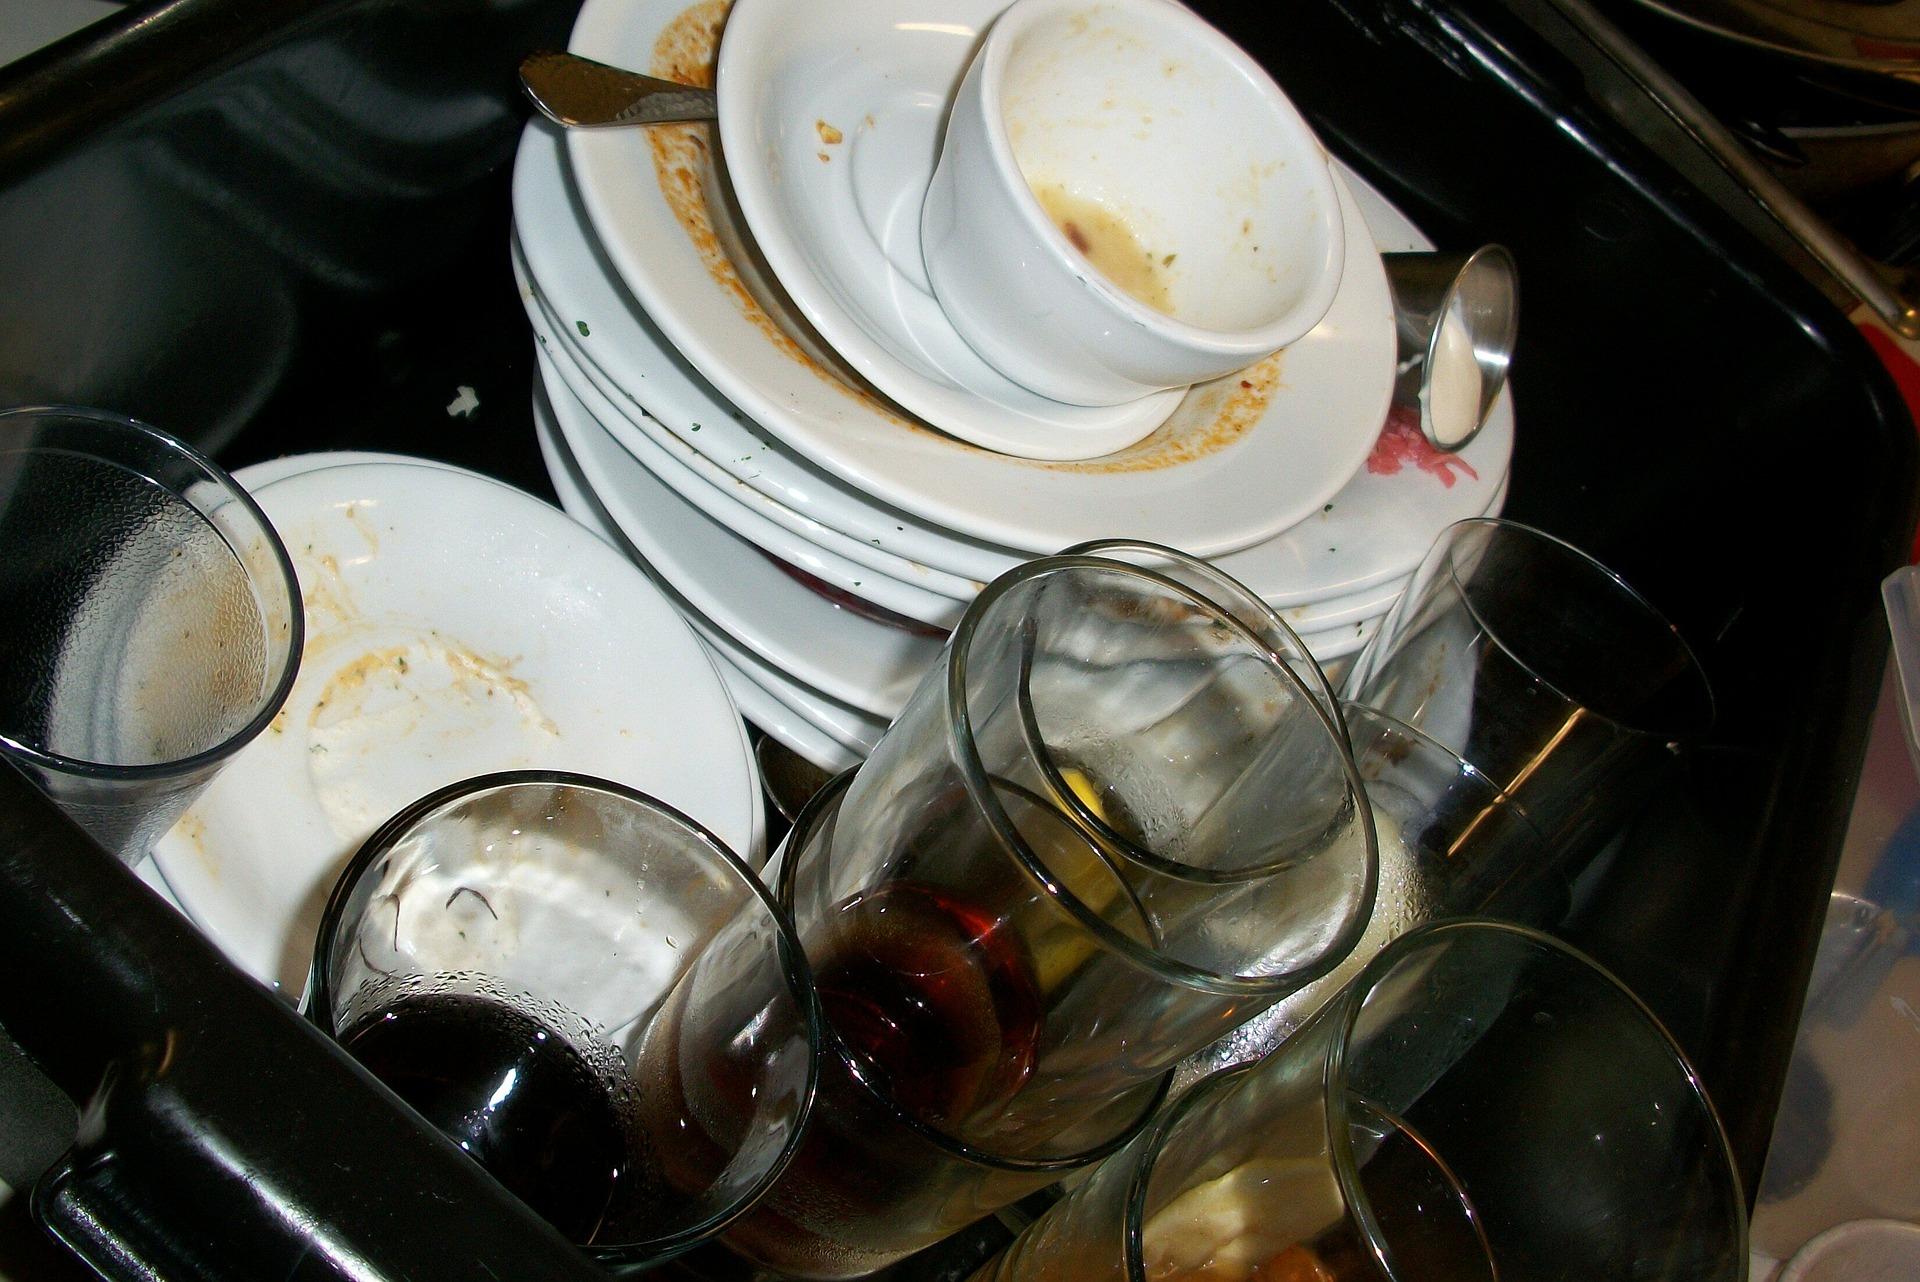 dishes-197_1920.jpg